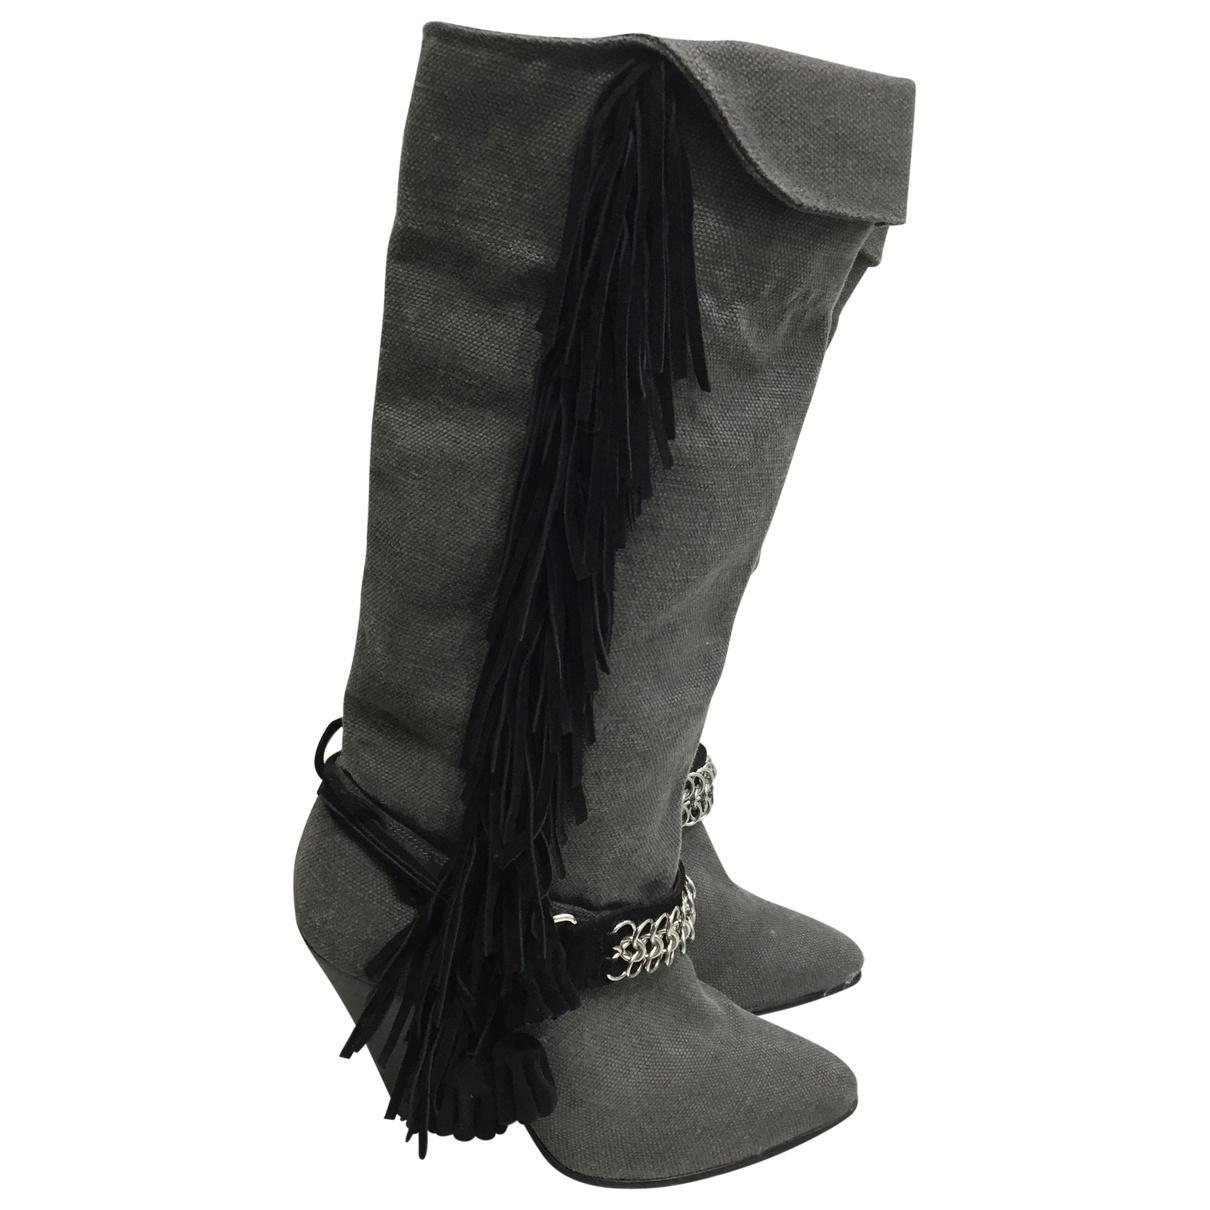 Pre-owned - Cloth boots Balmain cFd5n8